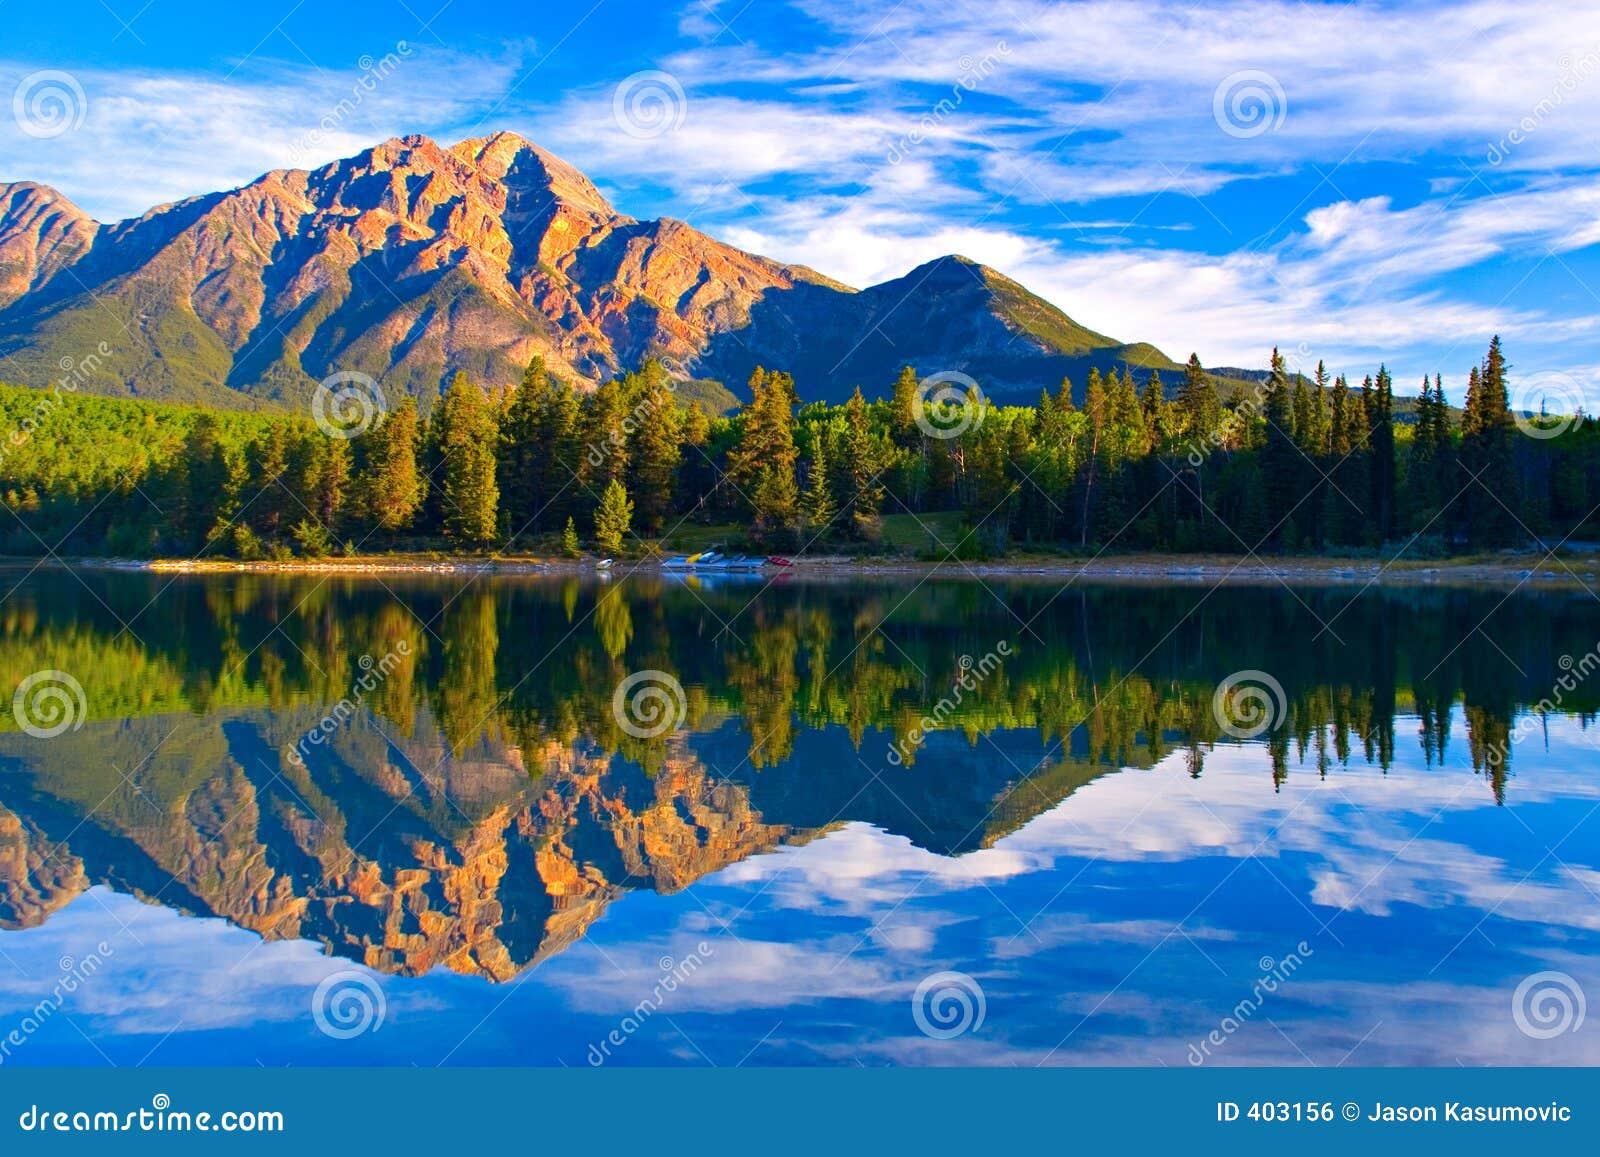 images Patricia Lake